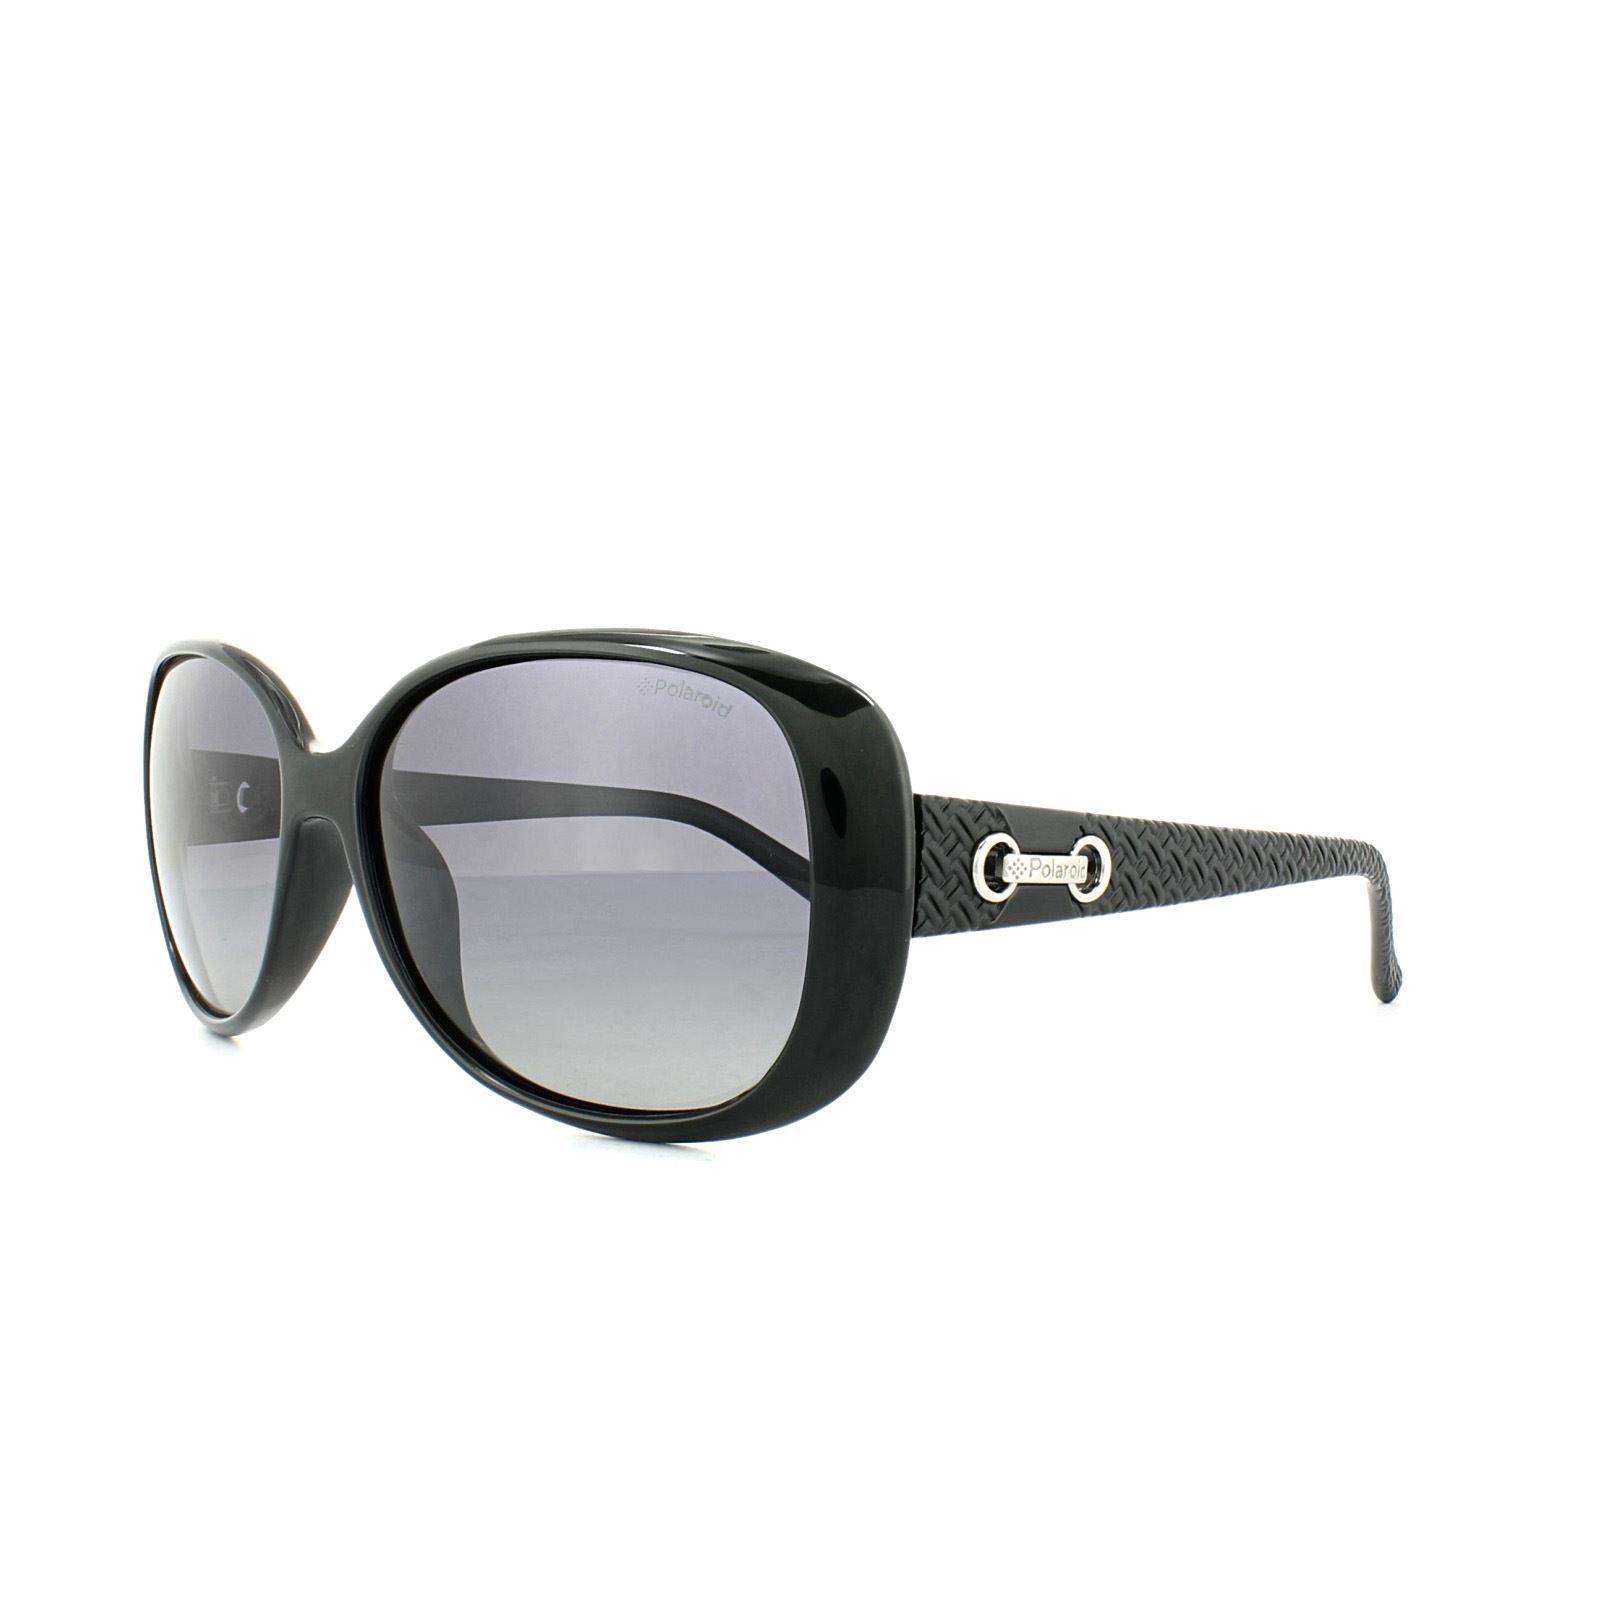 Polaroid Sunglasses P8430 KIH IX Black Grey Gradient Polarized